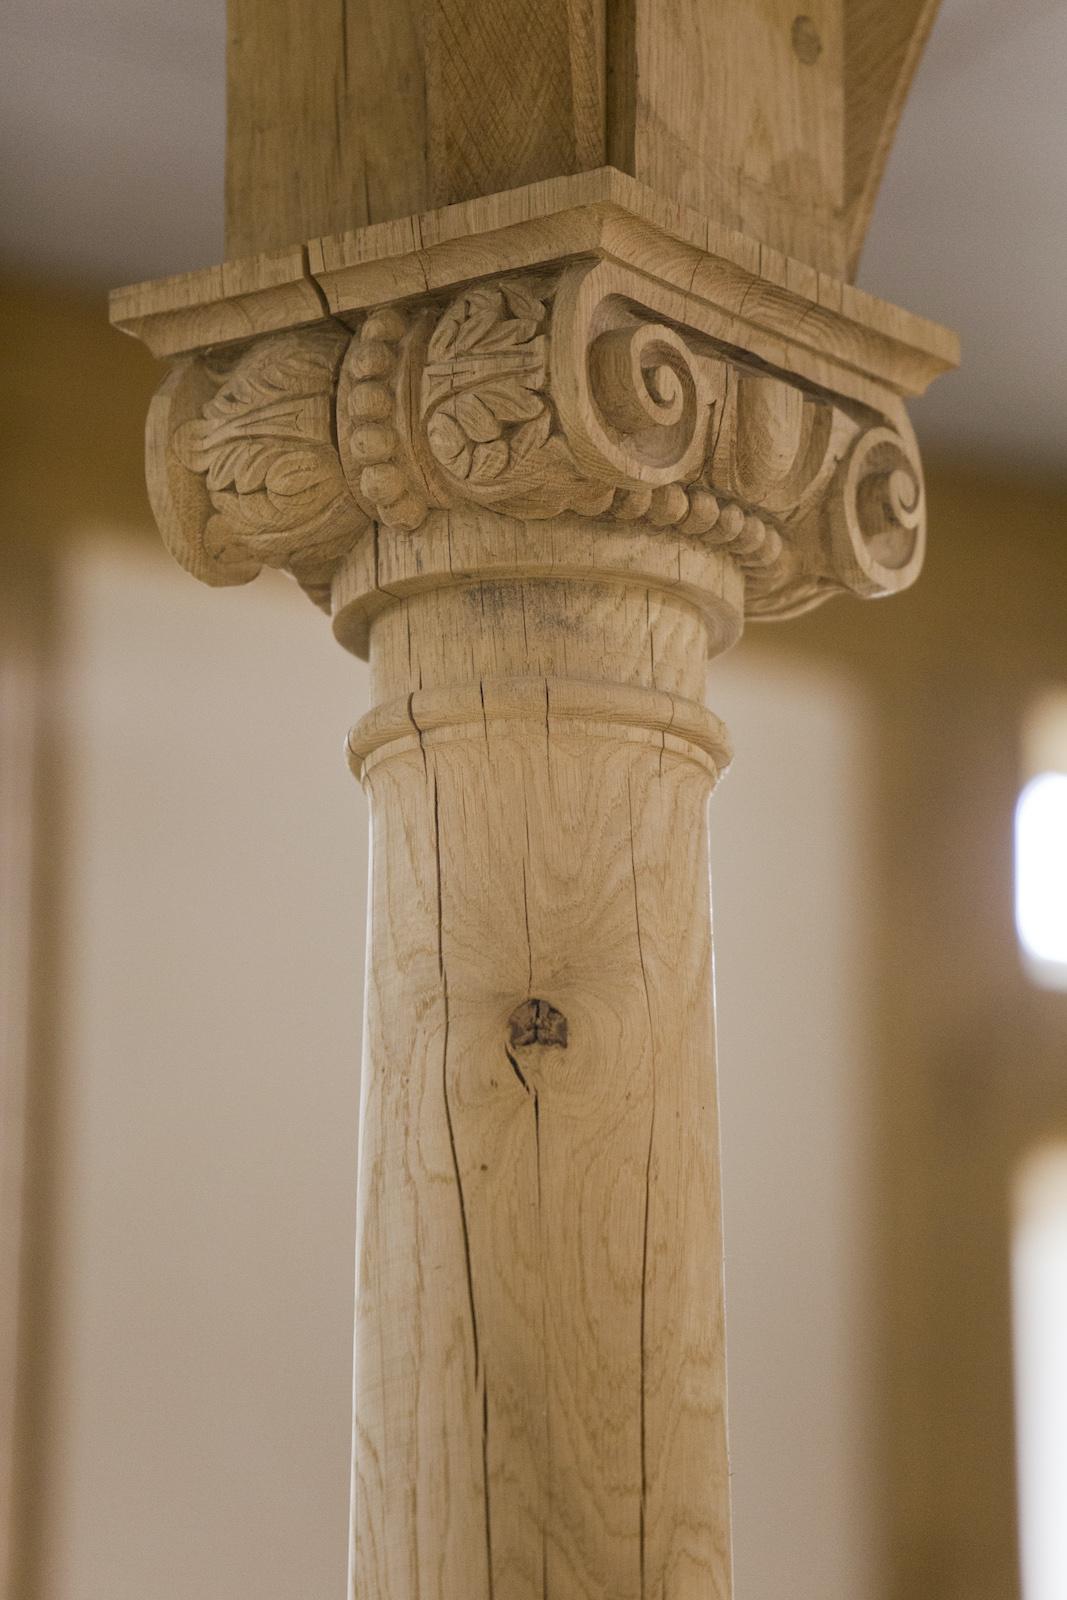 A single wooden beam